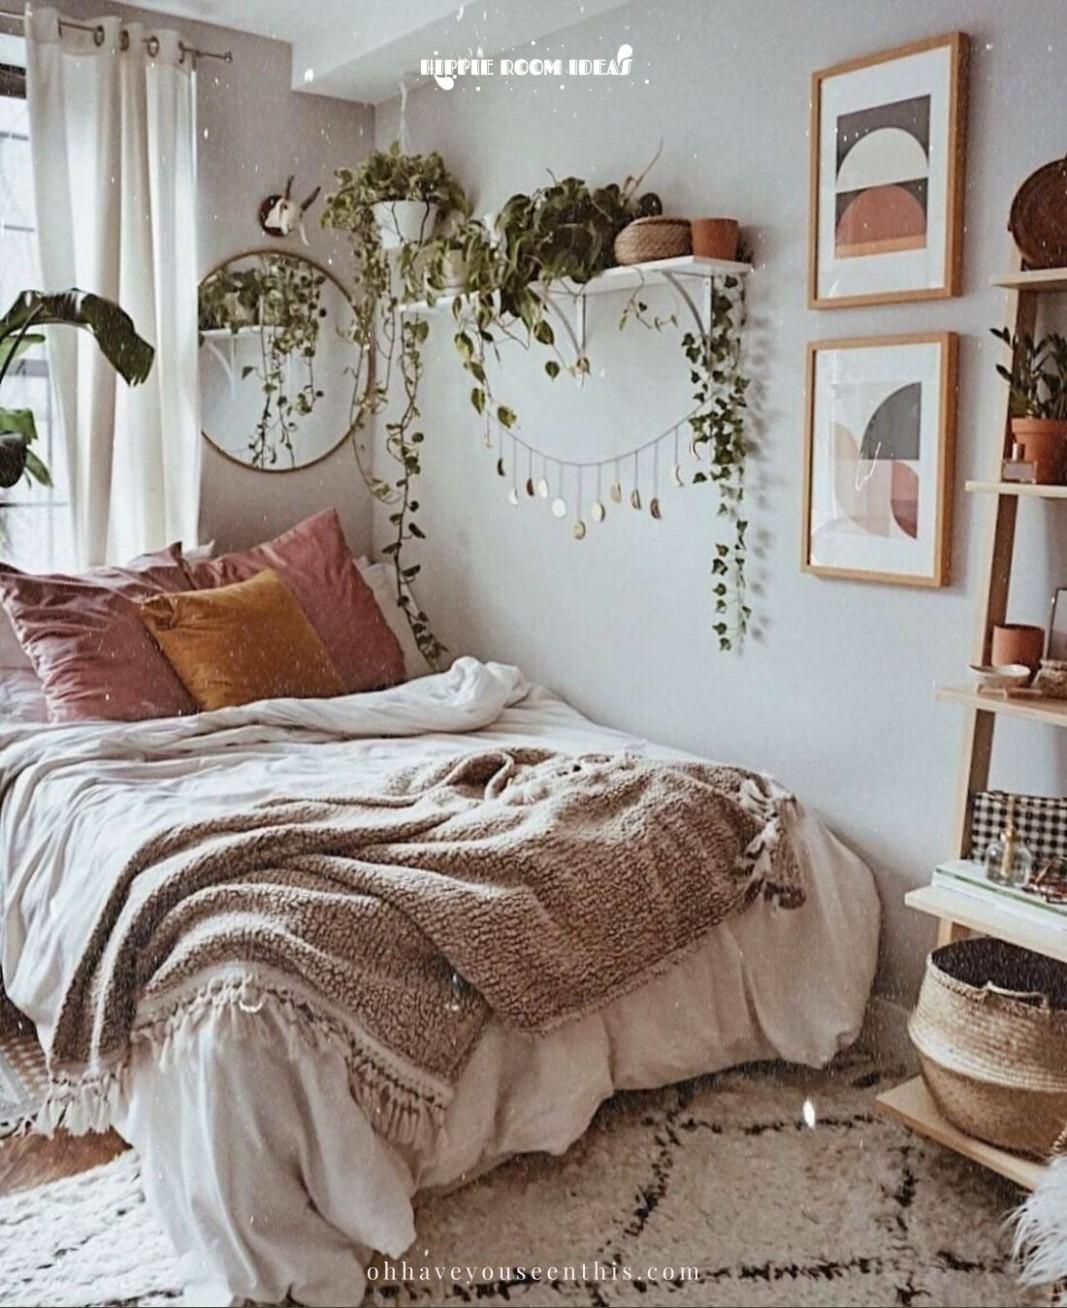 11 Most Popular Hippie Room Ideas in 1111 - The Good Luck Duck - Bedroom Ideas Hippie